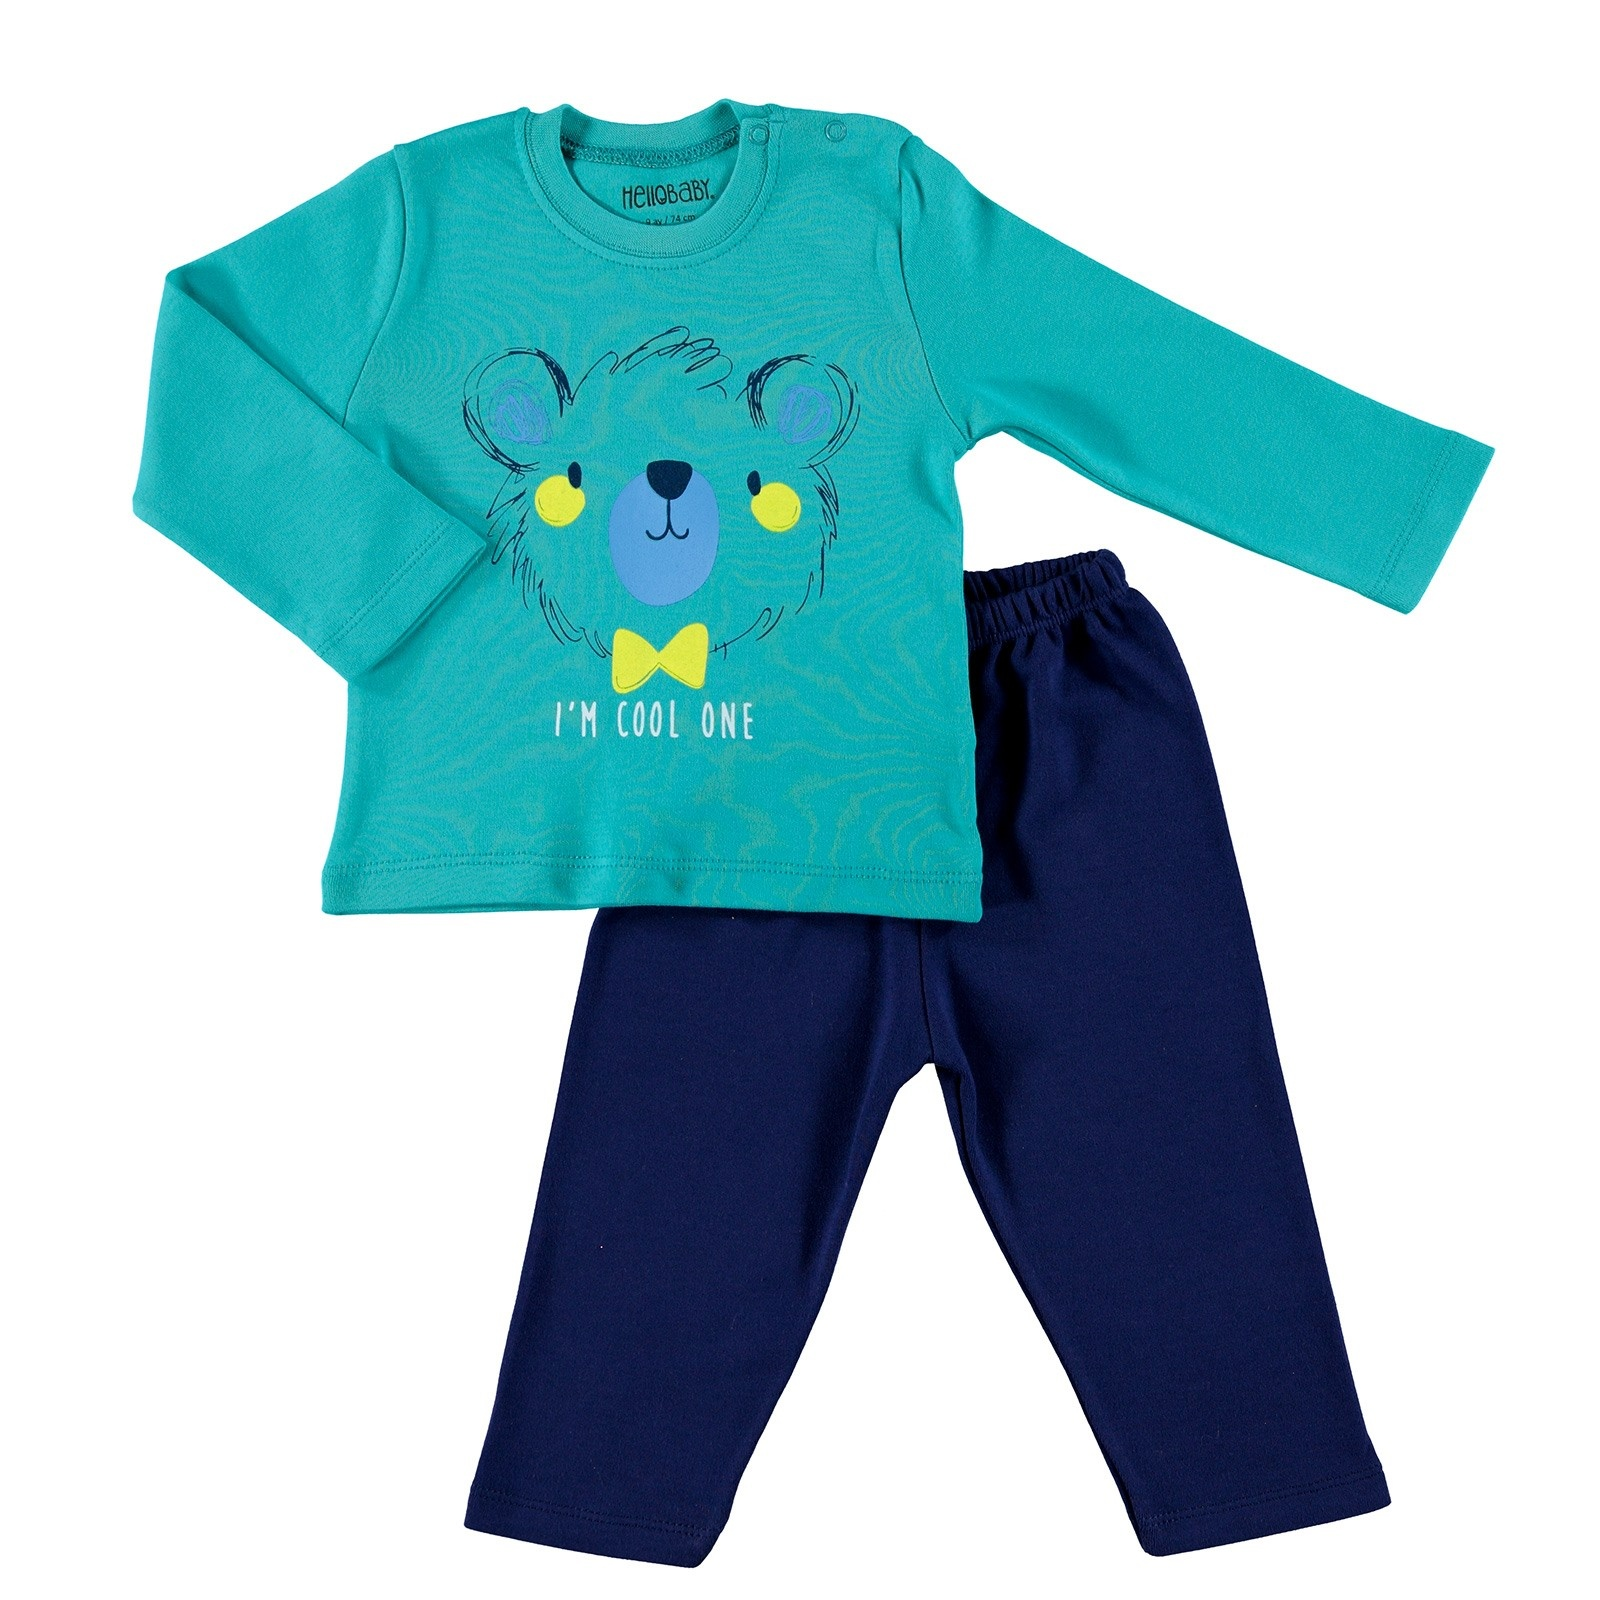 Ebebek HelloBaby Printed Interlock Long Sleeve Ribbed Snap Neck Single Baby Pajama Set